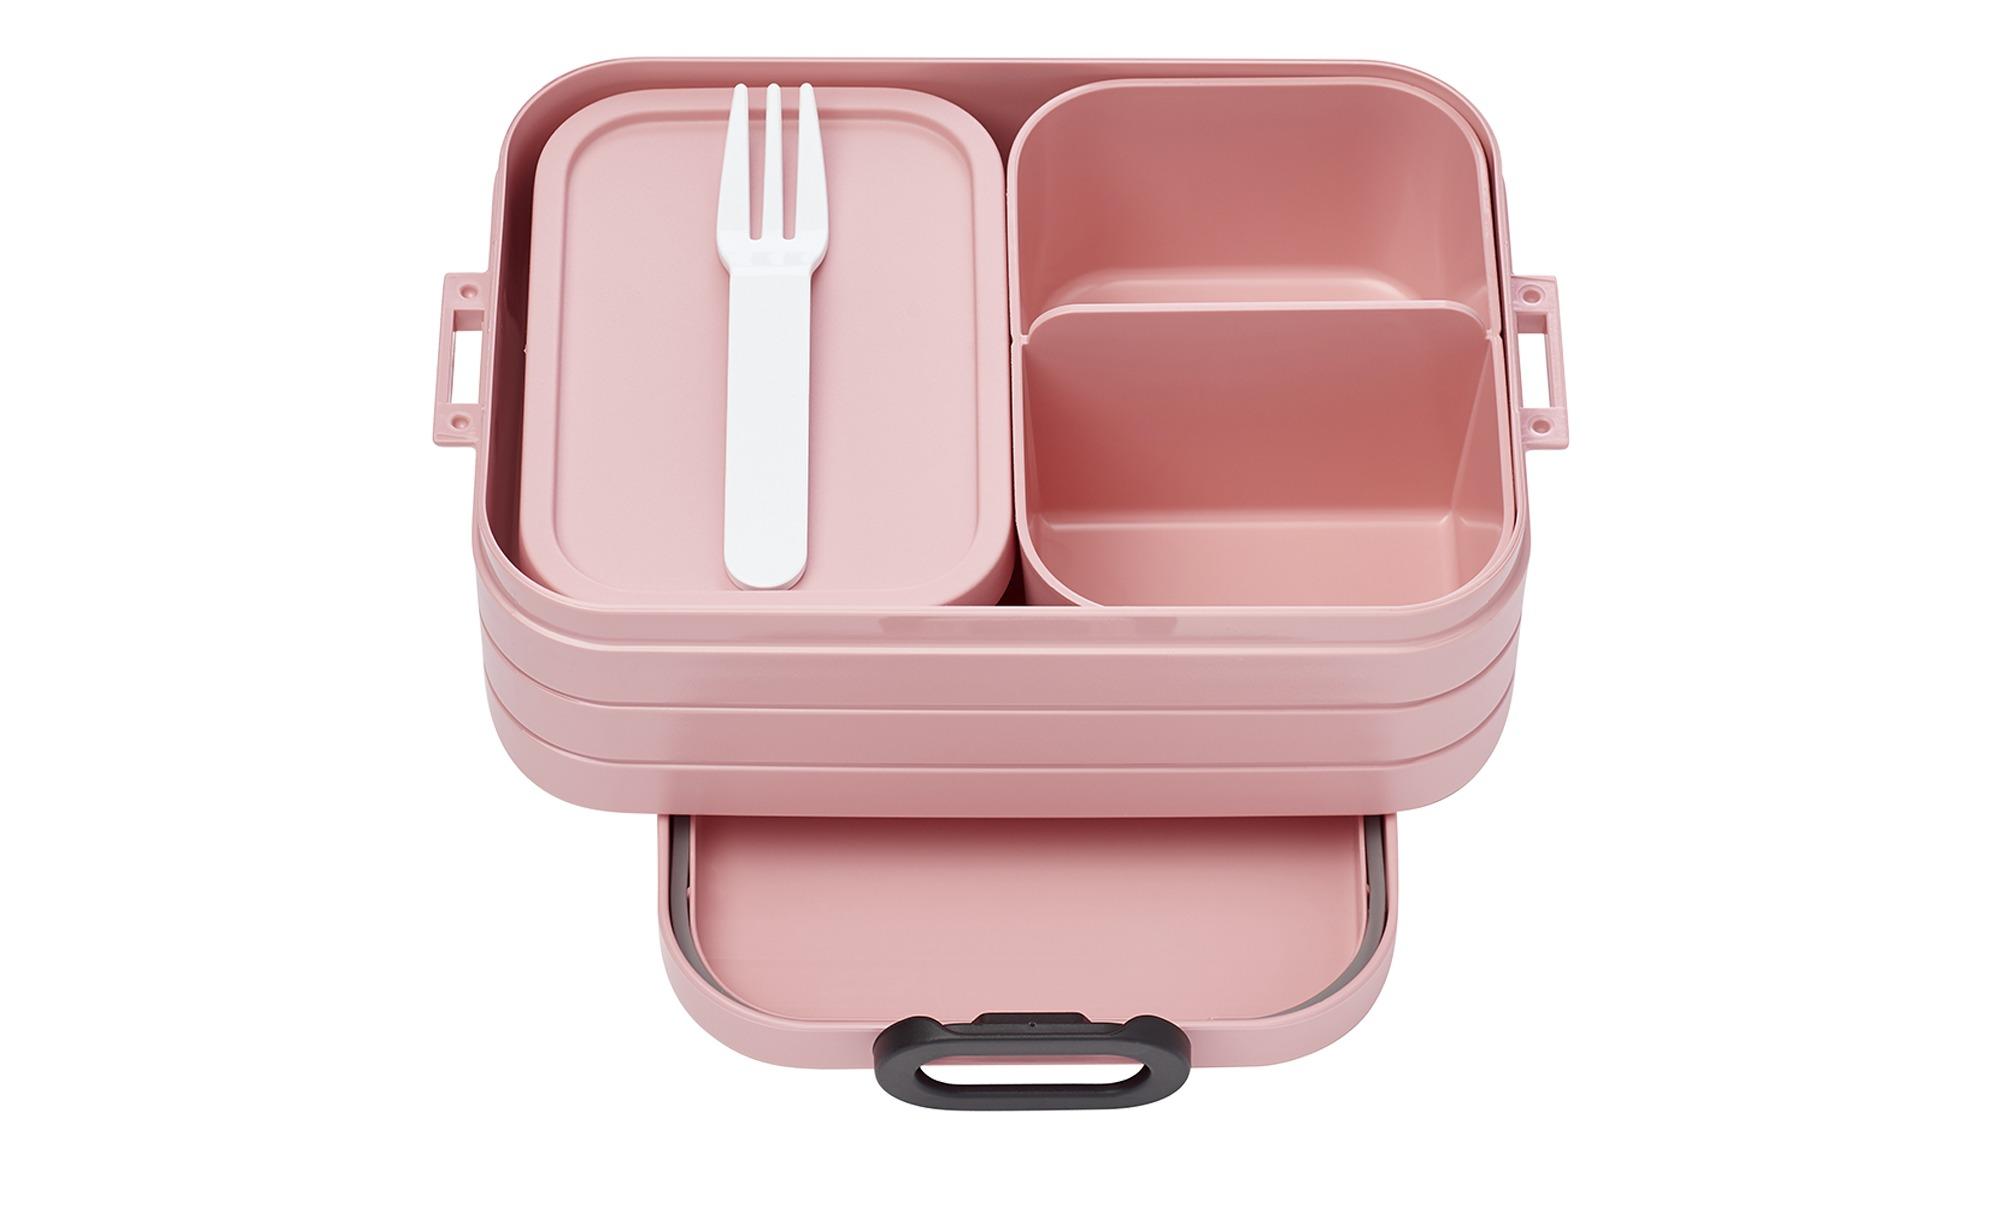 Mepal Bento Lunchbox To Go 0 9l Take A Break Midi Rosa Pink Kunststoff Masse Cm B 12 H 6 5 Kuchenzubehor Helfer Vorratsbehalter Hoffner Moebel Suchmaschine Ladendirekt De